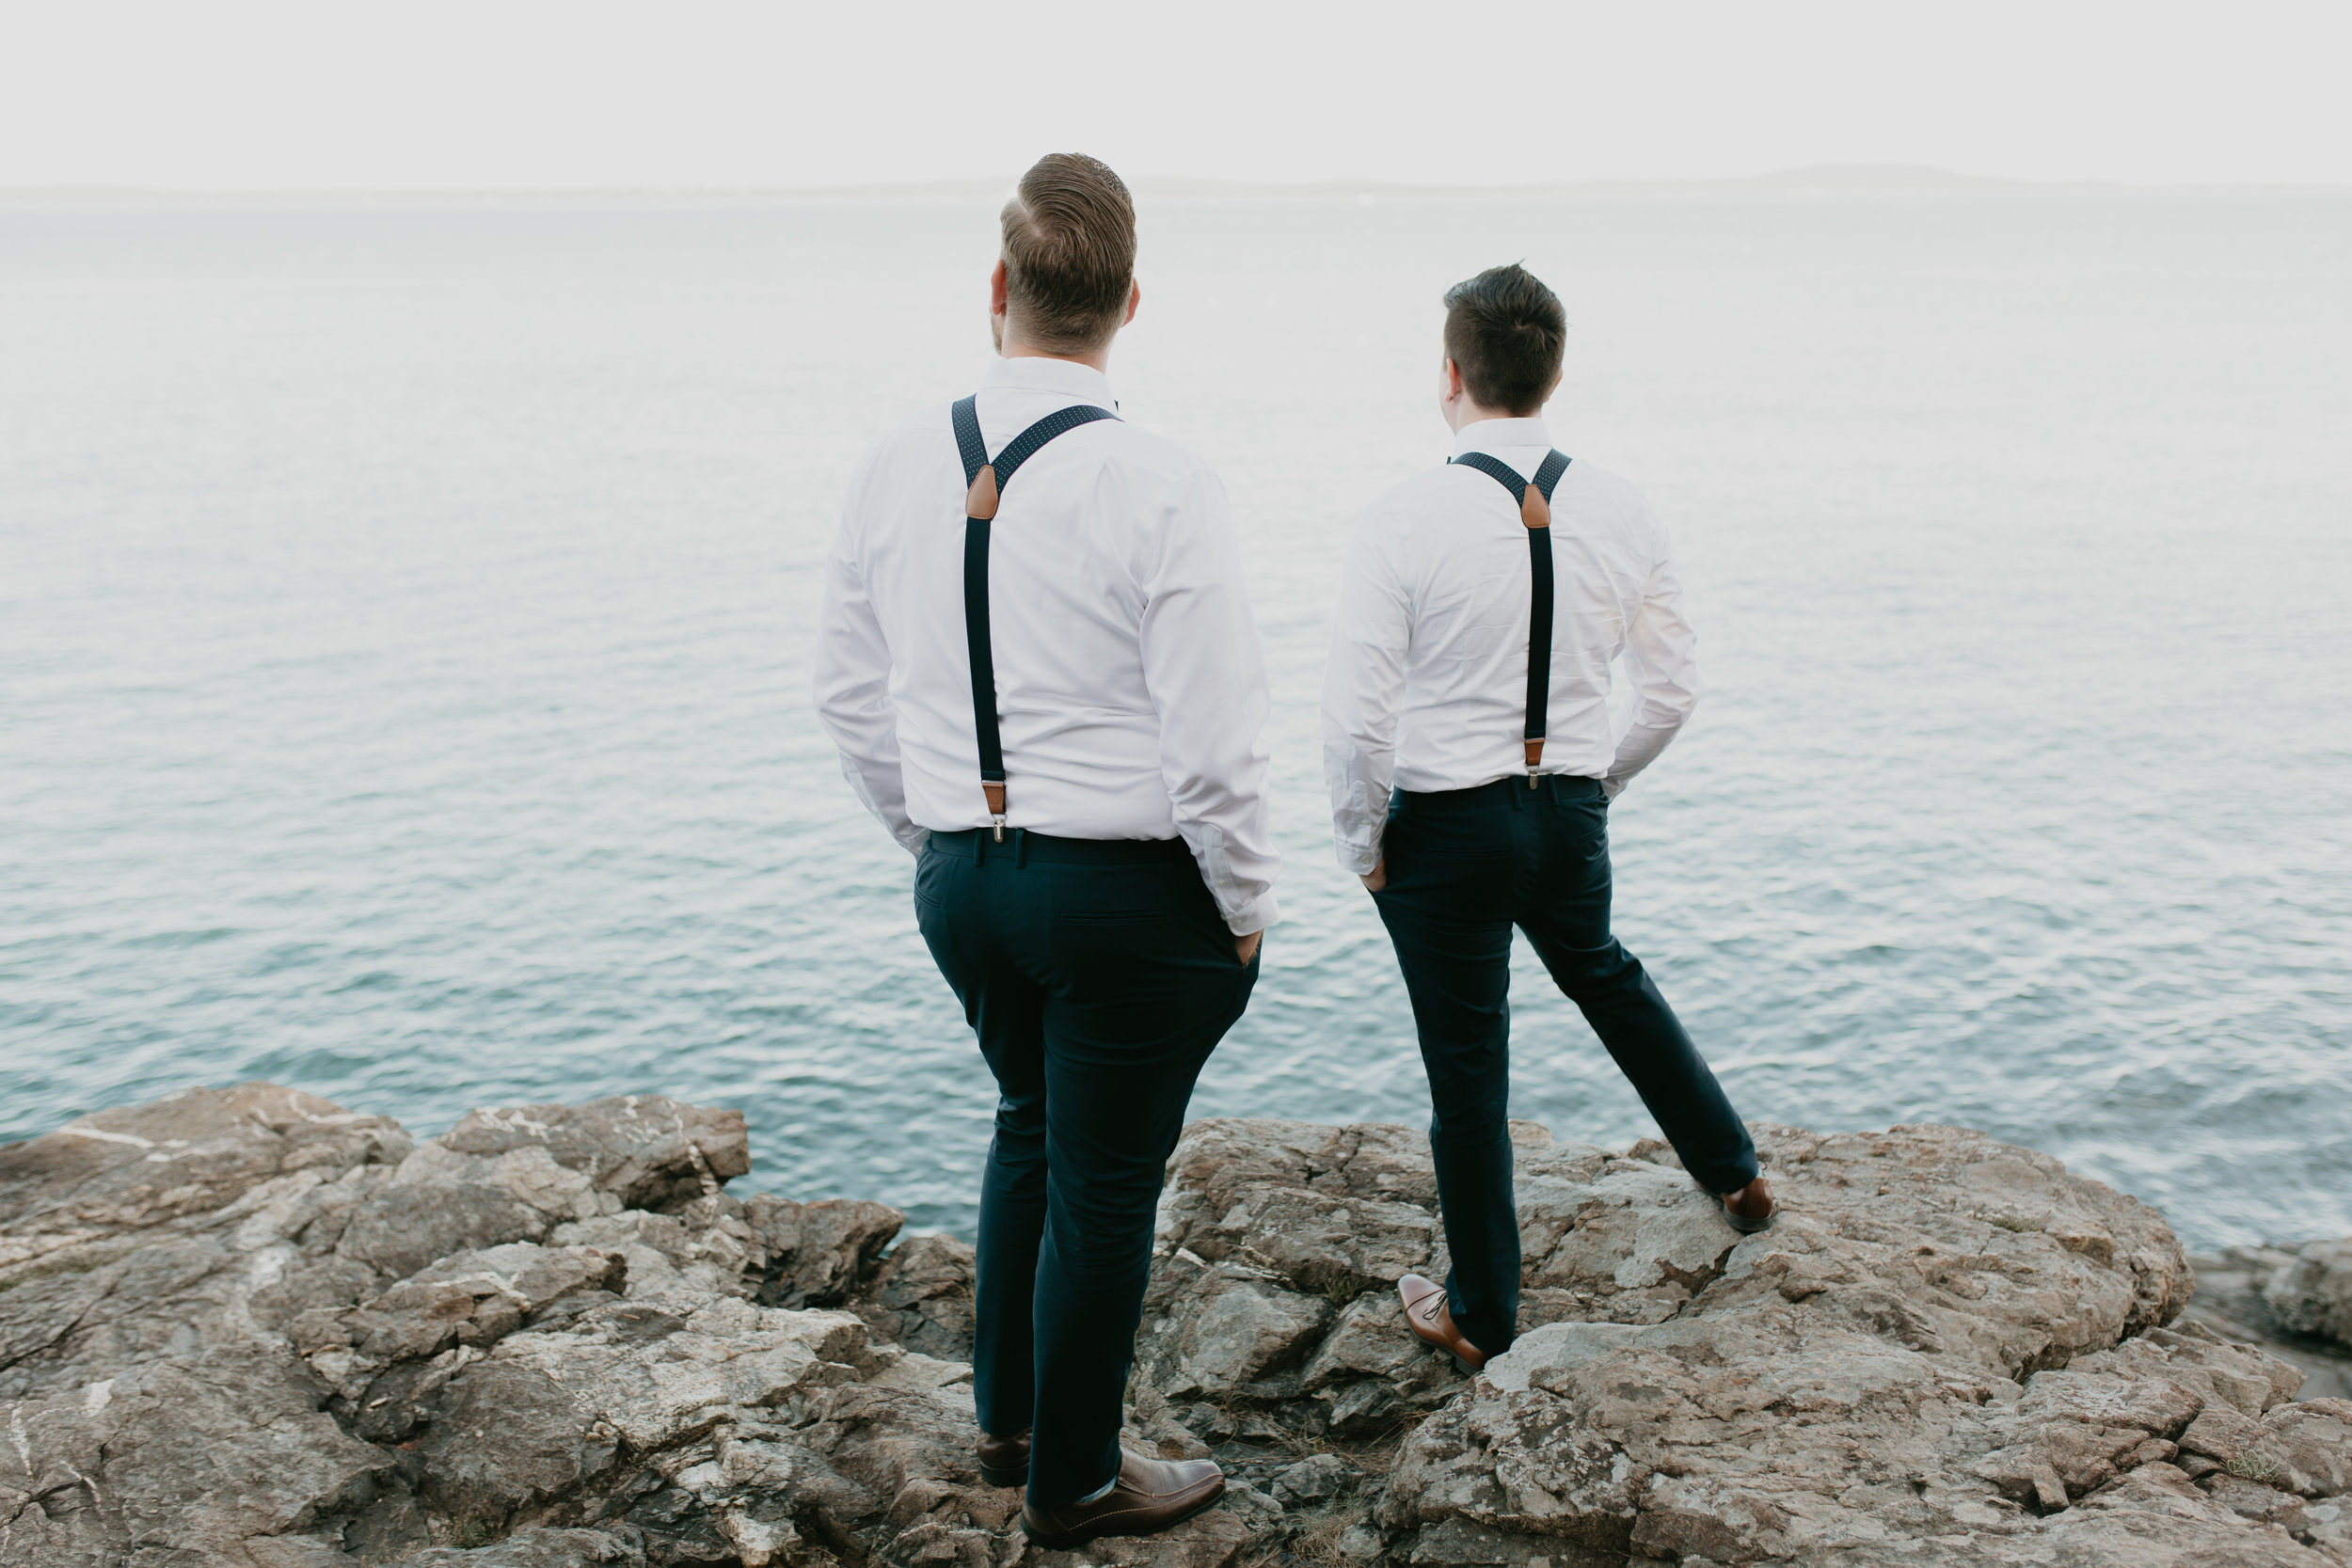 nicole-daacke-photography-Elopement-rocky-shoreline-coast-Acadia-National-Park-elopement-photographer-inspiration-maine-elopement-otter-cliffs-schoonic-head-point-31.jpg